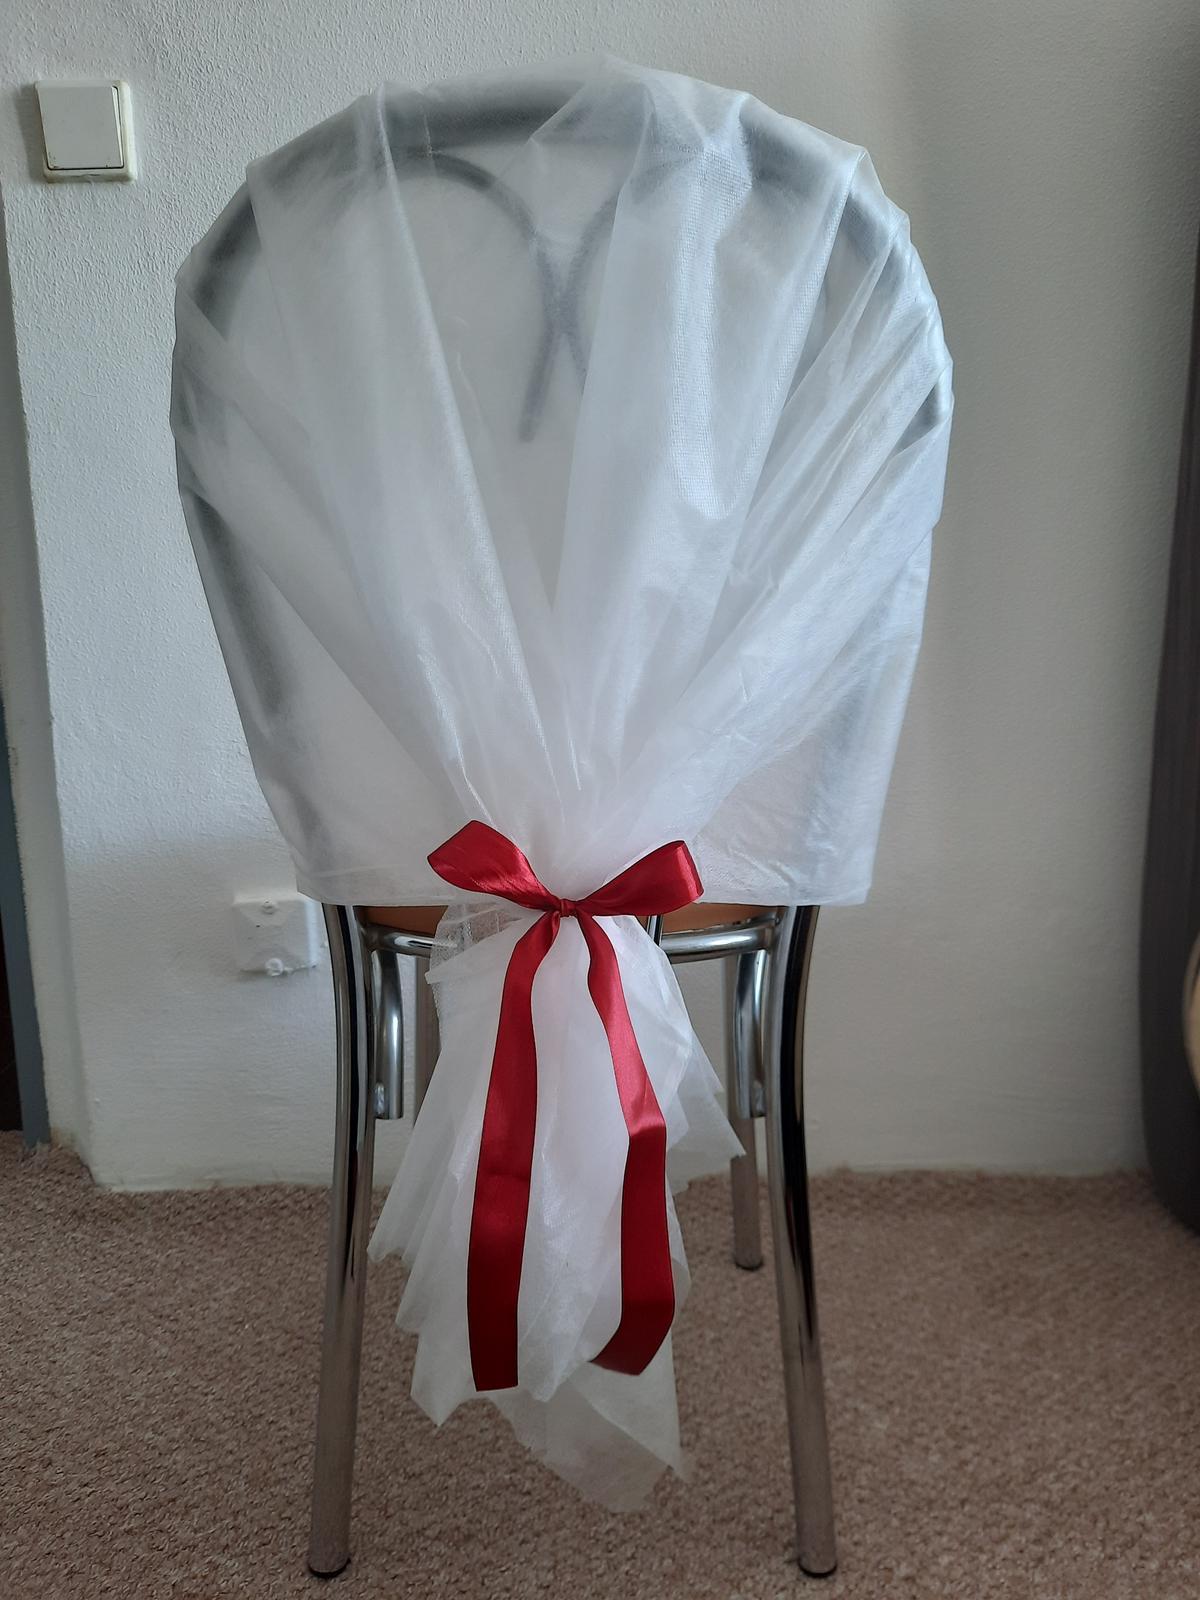 Potahy na židle z netkané textilie s mašlemi - Obrázek č. 1